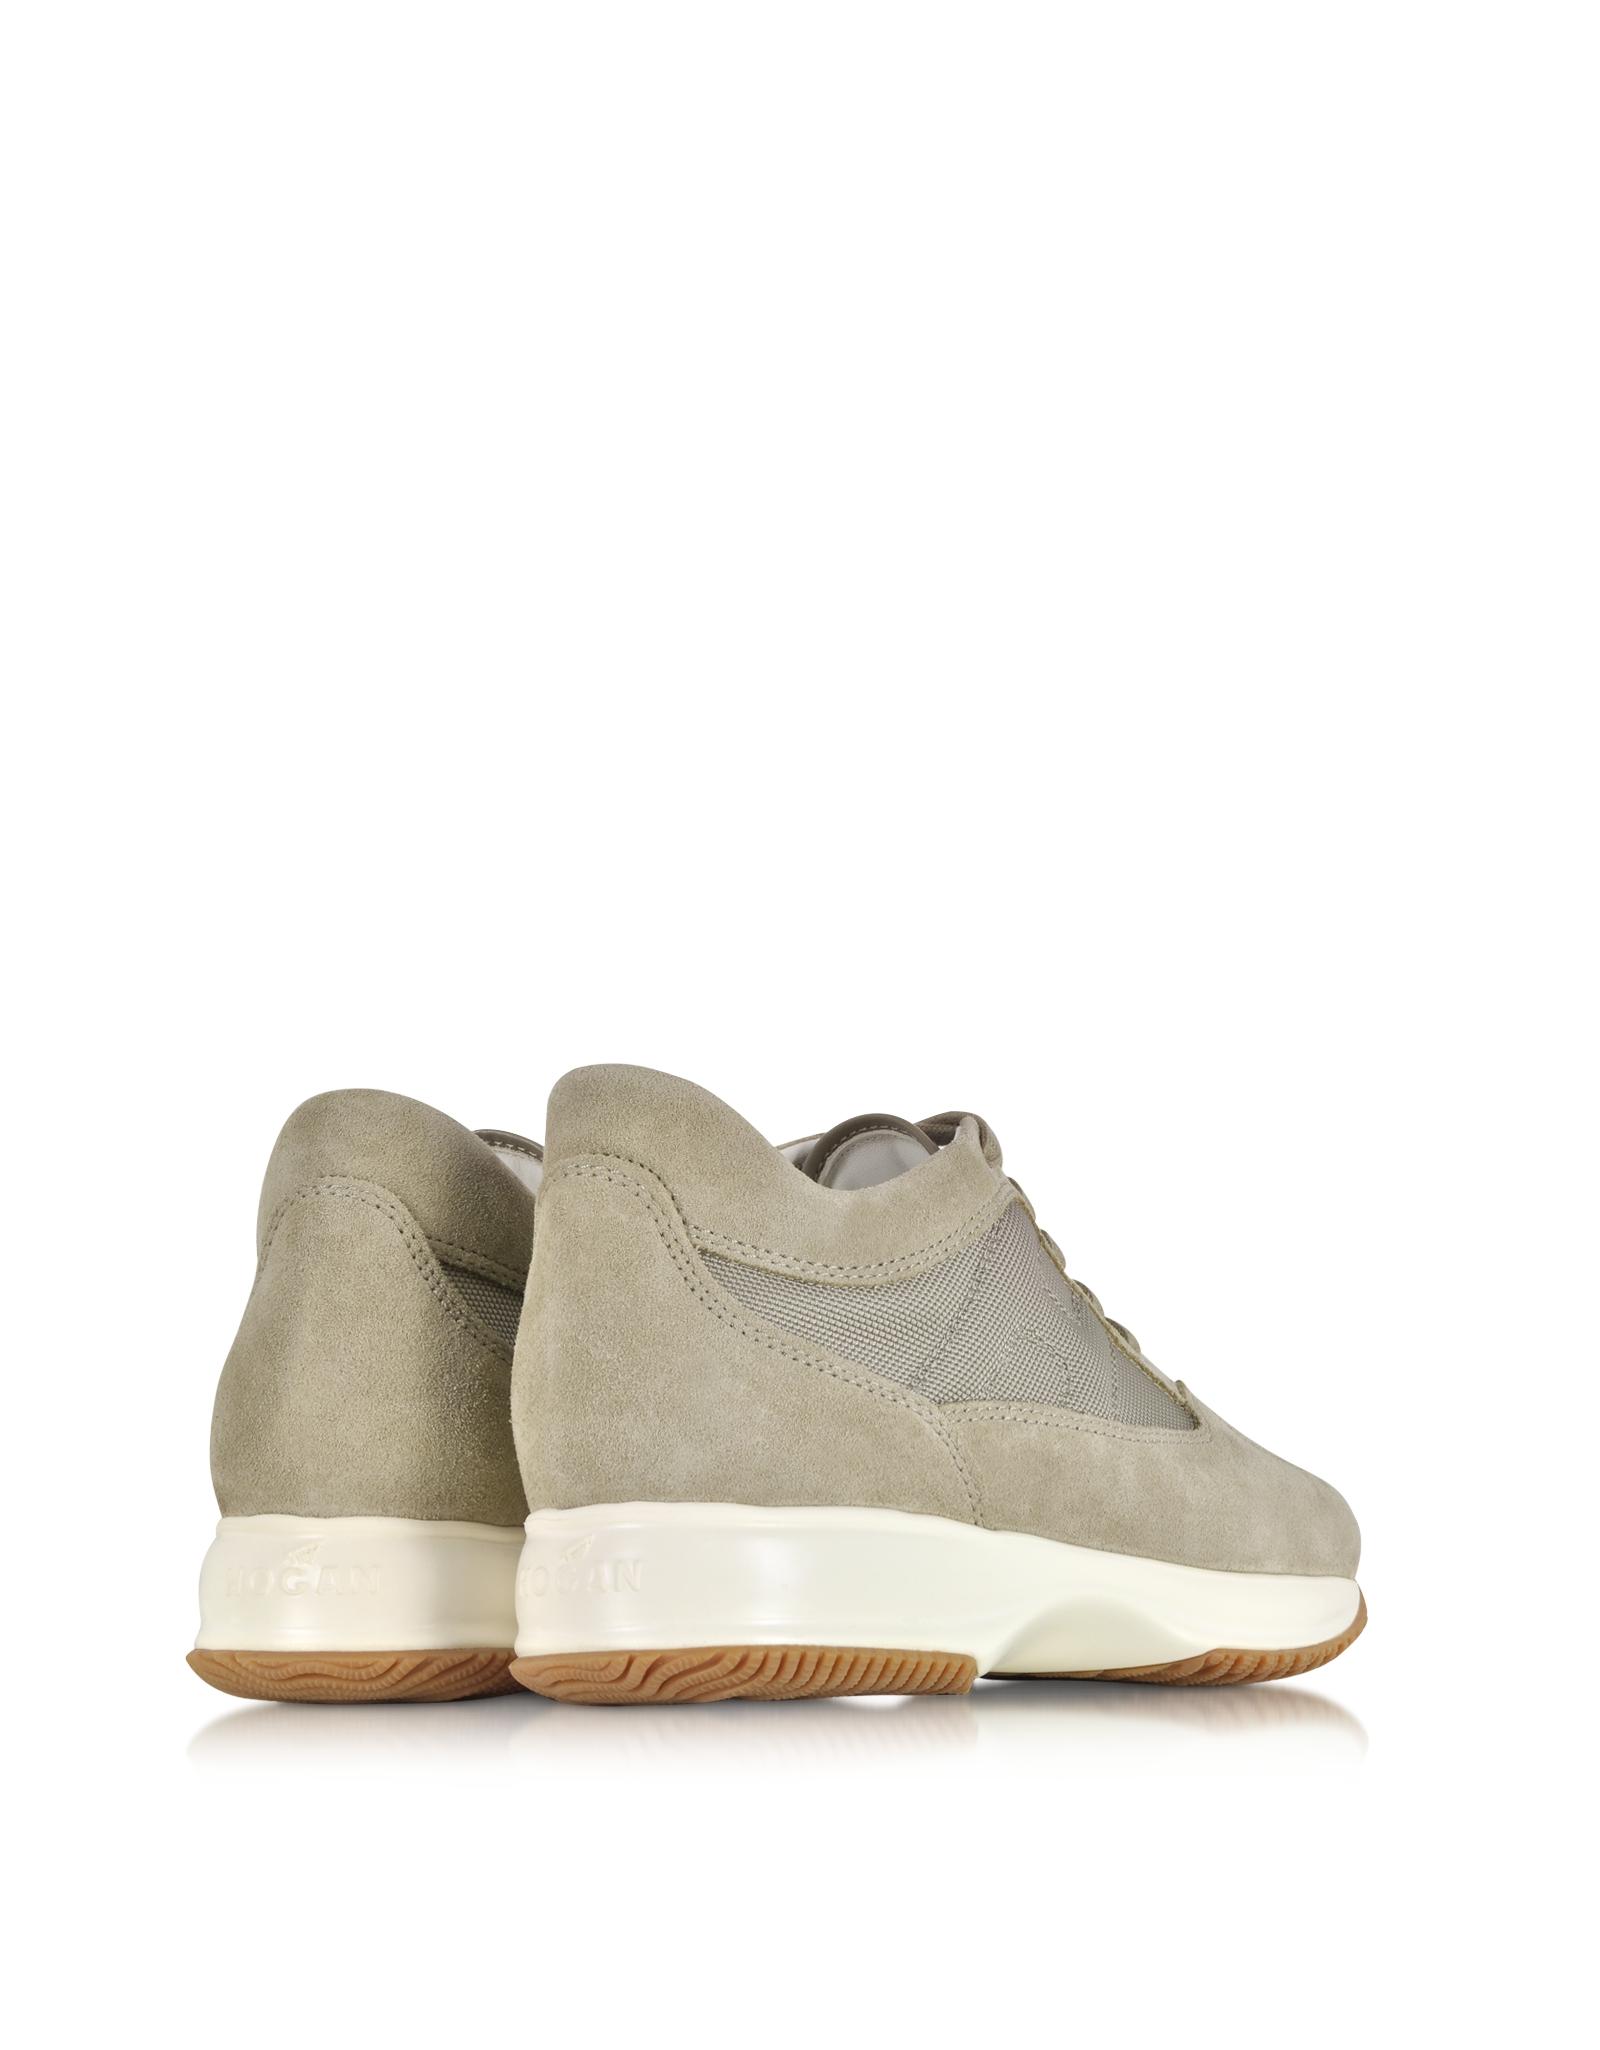 1da9e79e972 Hogan Interactive Beige Suede Sneaker in Gray for Men - Lyst